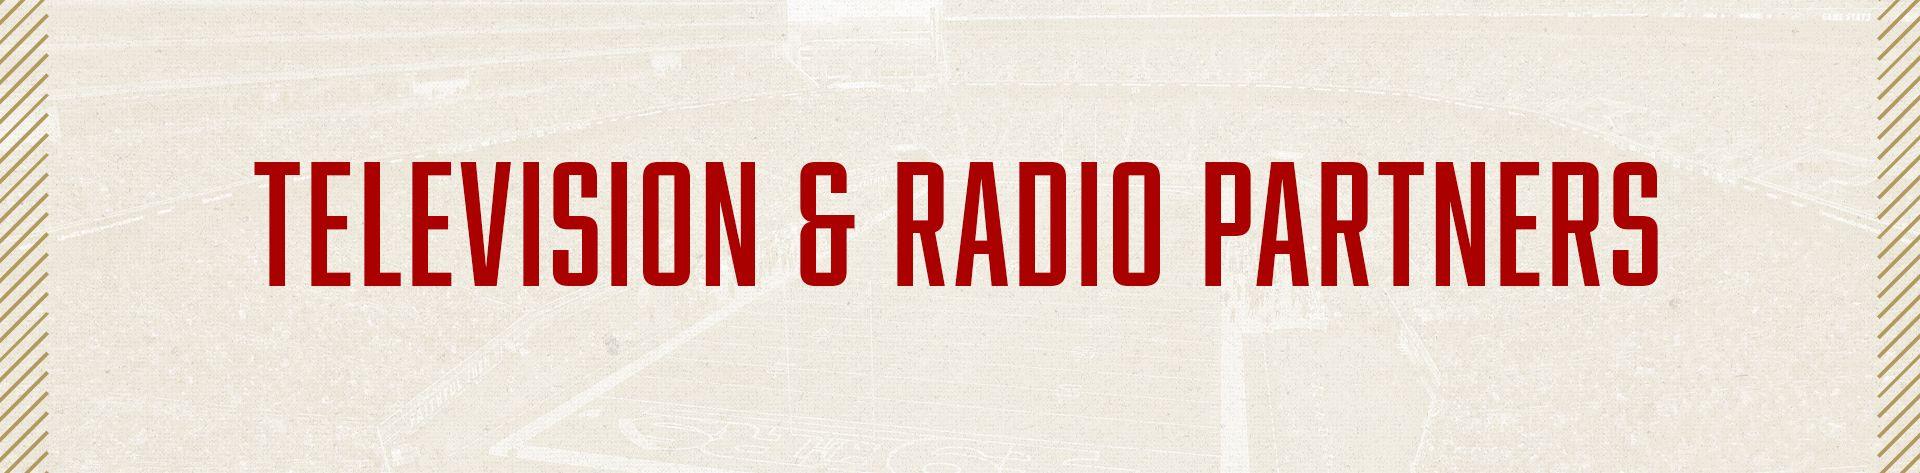 TV-RADIO-HEADER